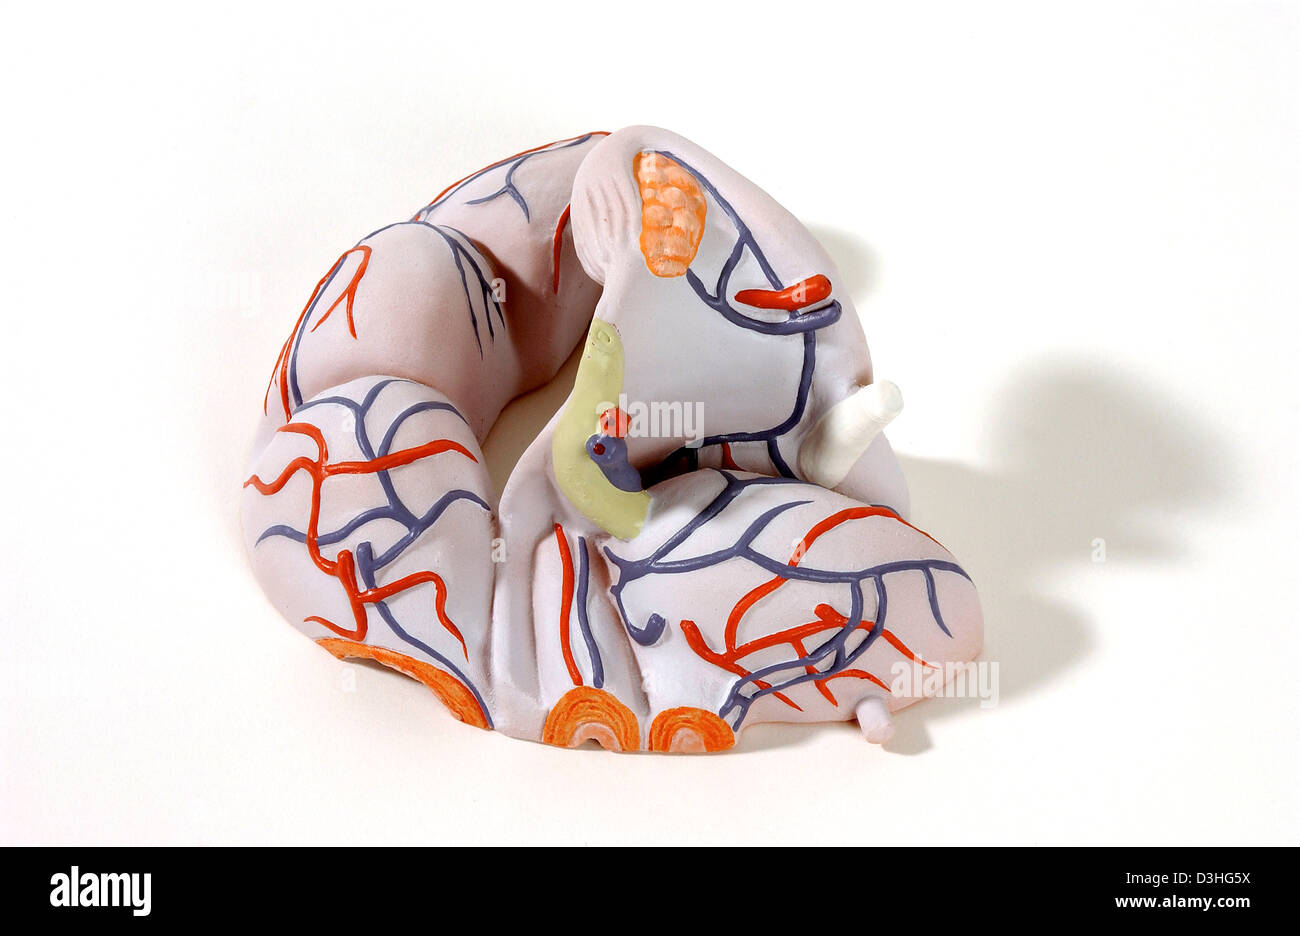 Uterus And Bowel Stockfotos & Uterus And Bowel Bilder - Alamy